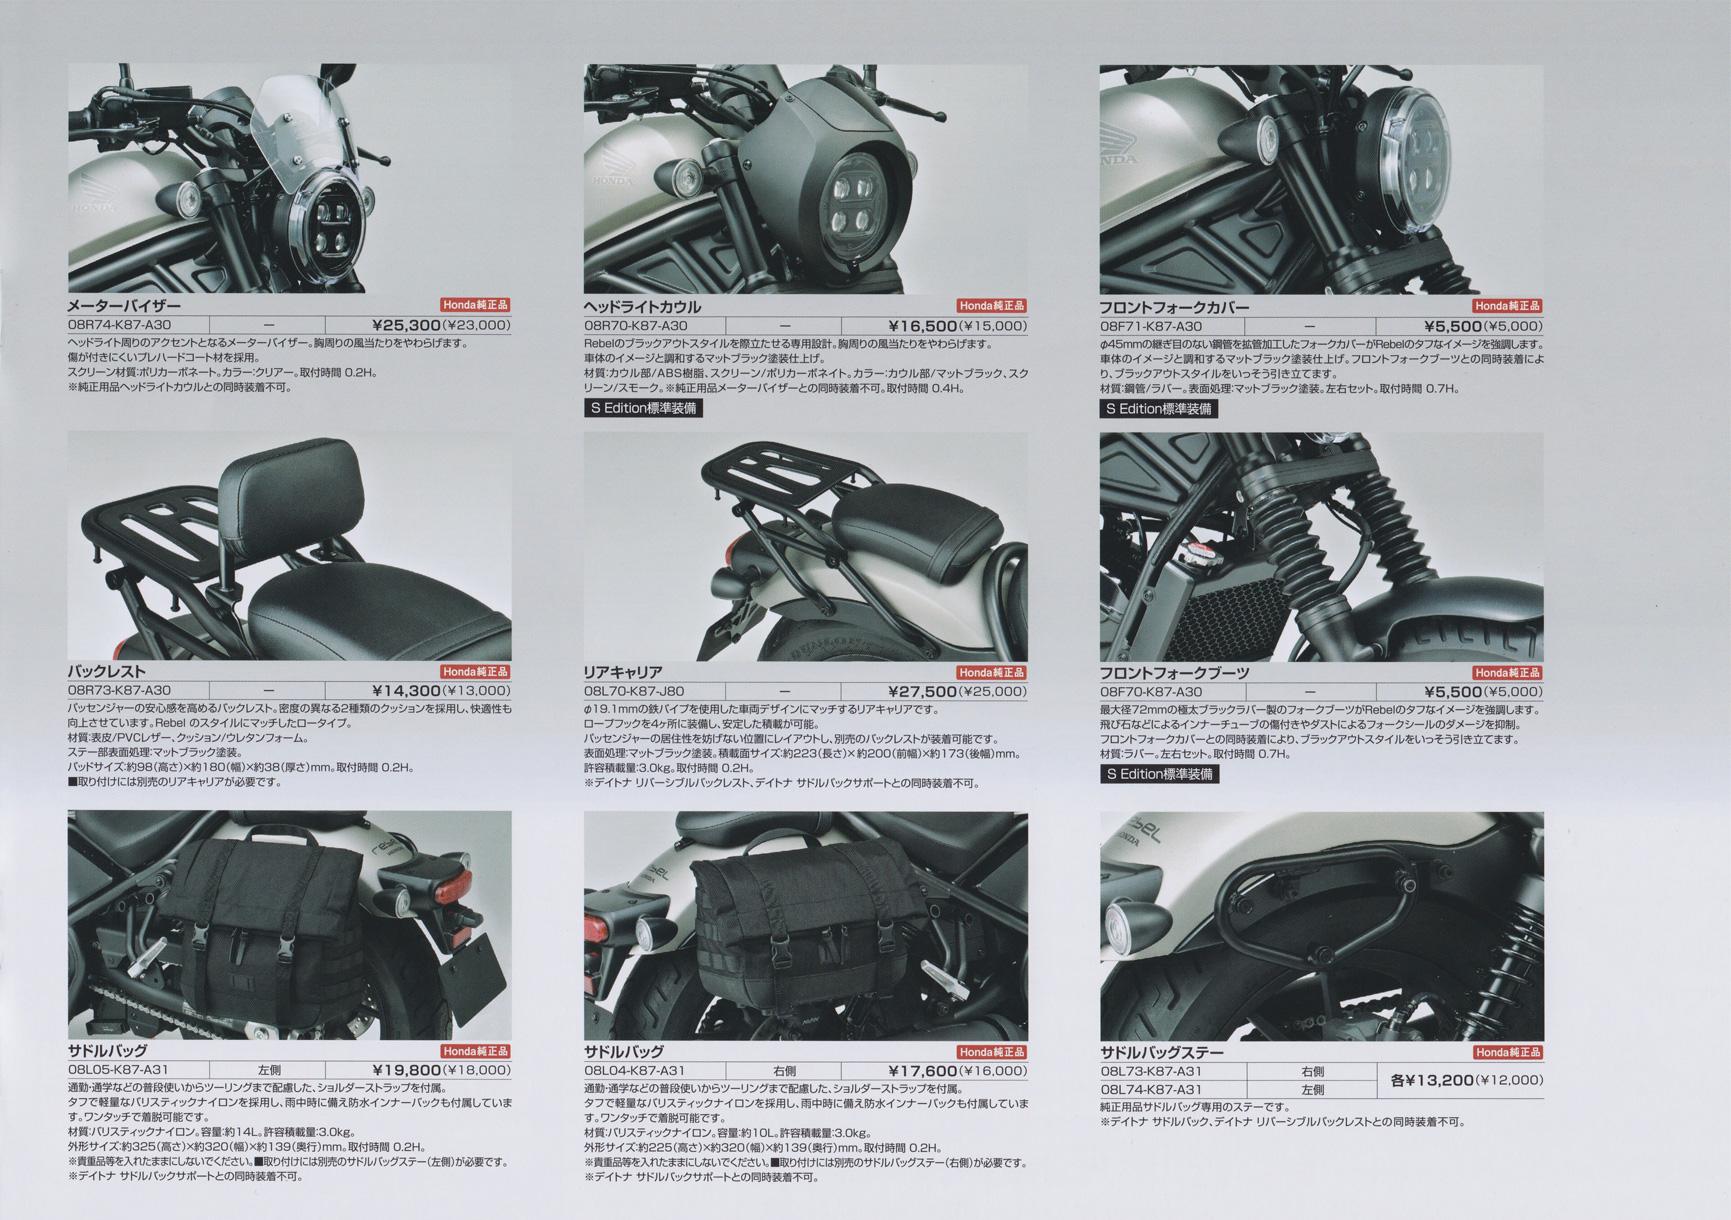 HONDA Rebel 250(2020年モデル) カスタマイズパーツカタログ